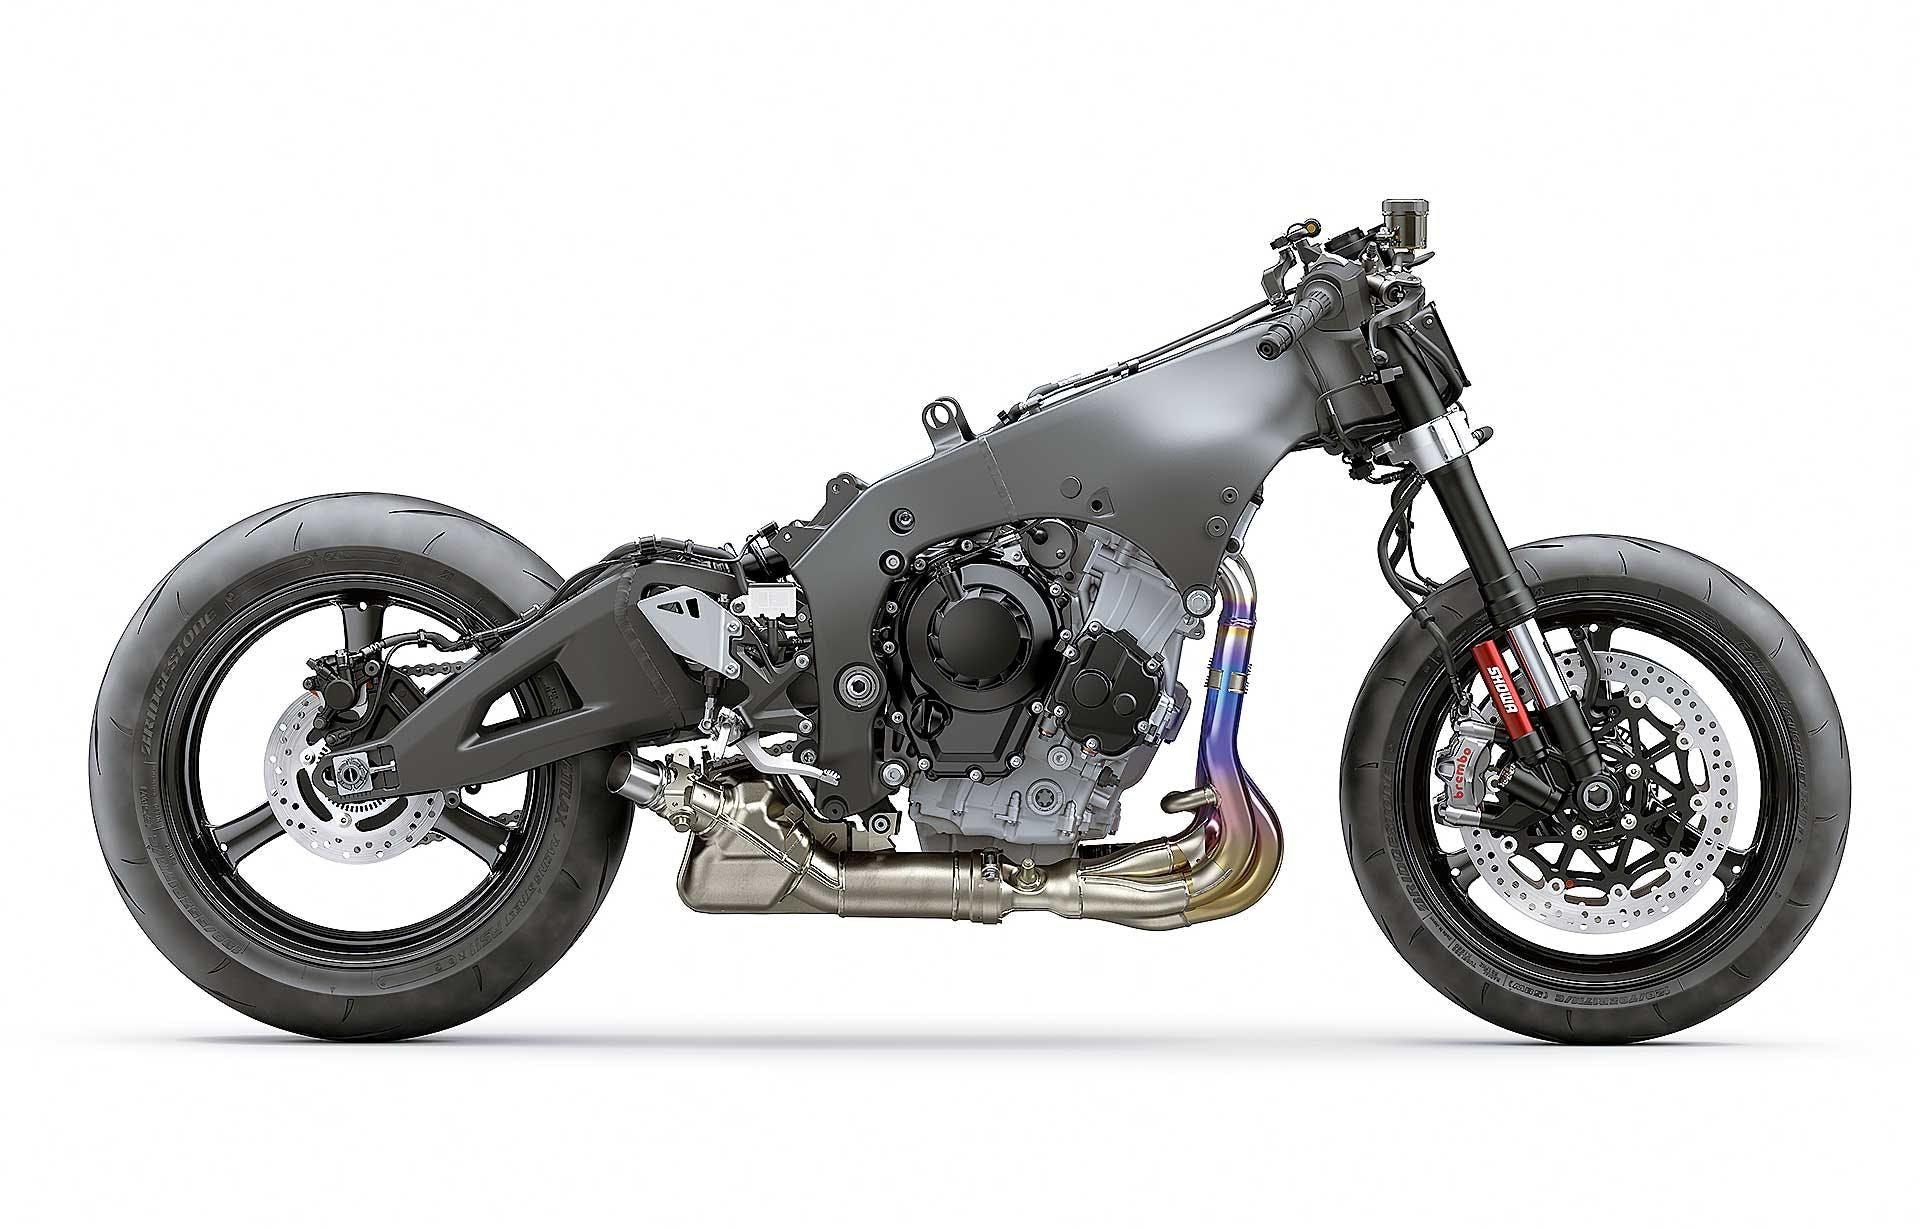 Kawasaki ZX-10R 2021 moto spogliata